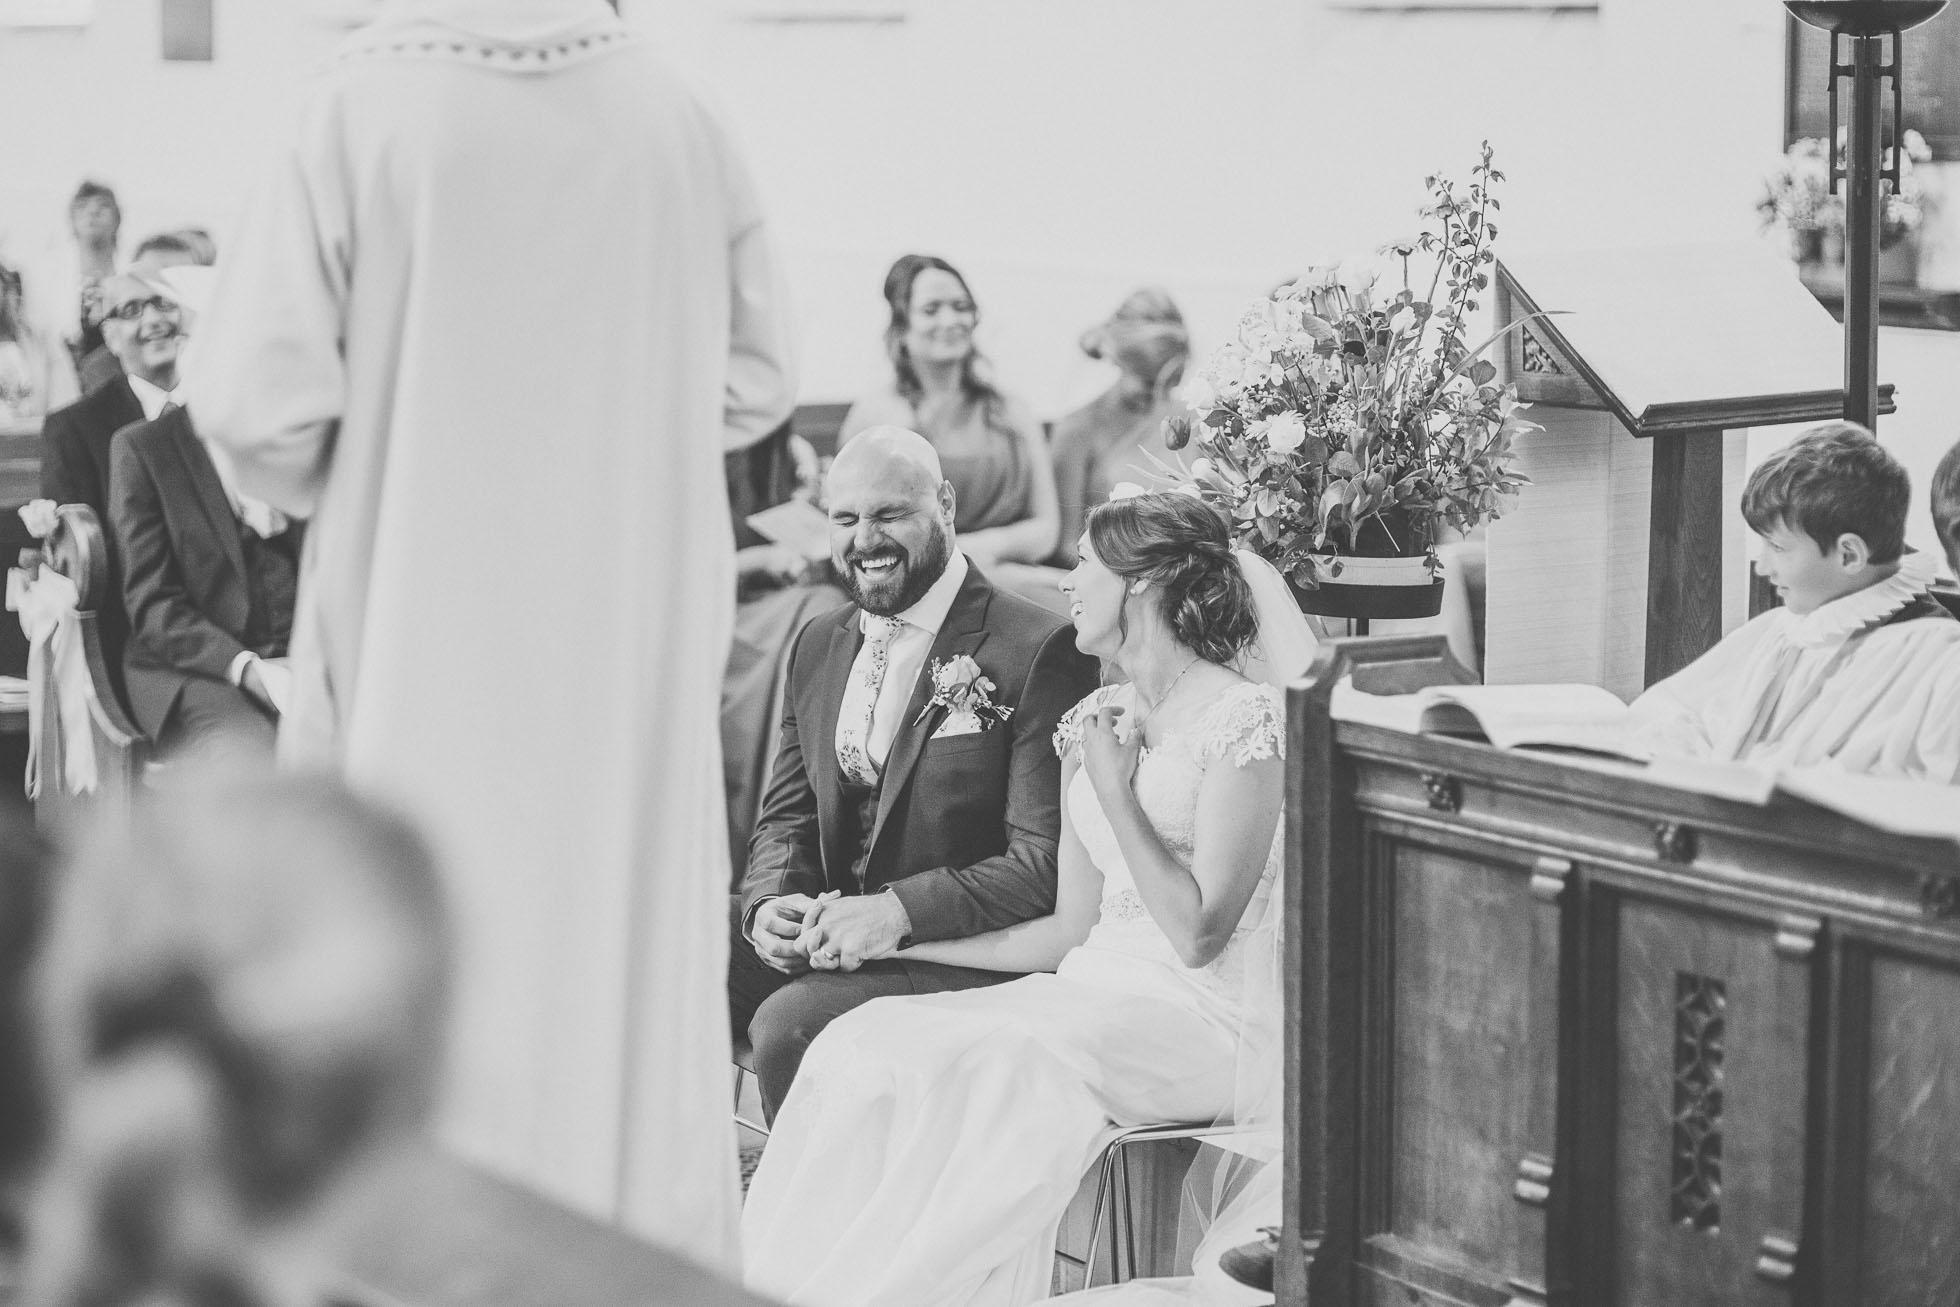 denton-hall-wedding-photographer-29.jpg